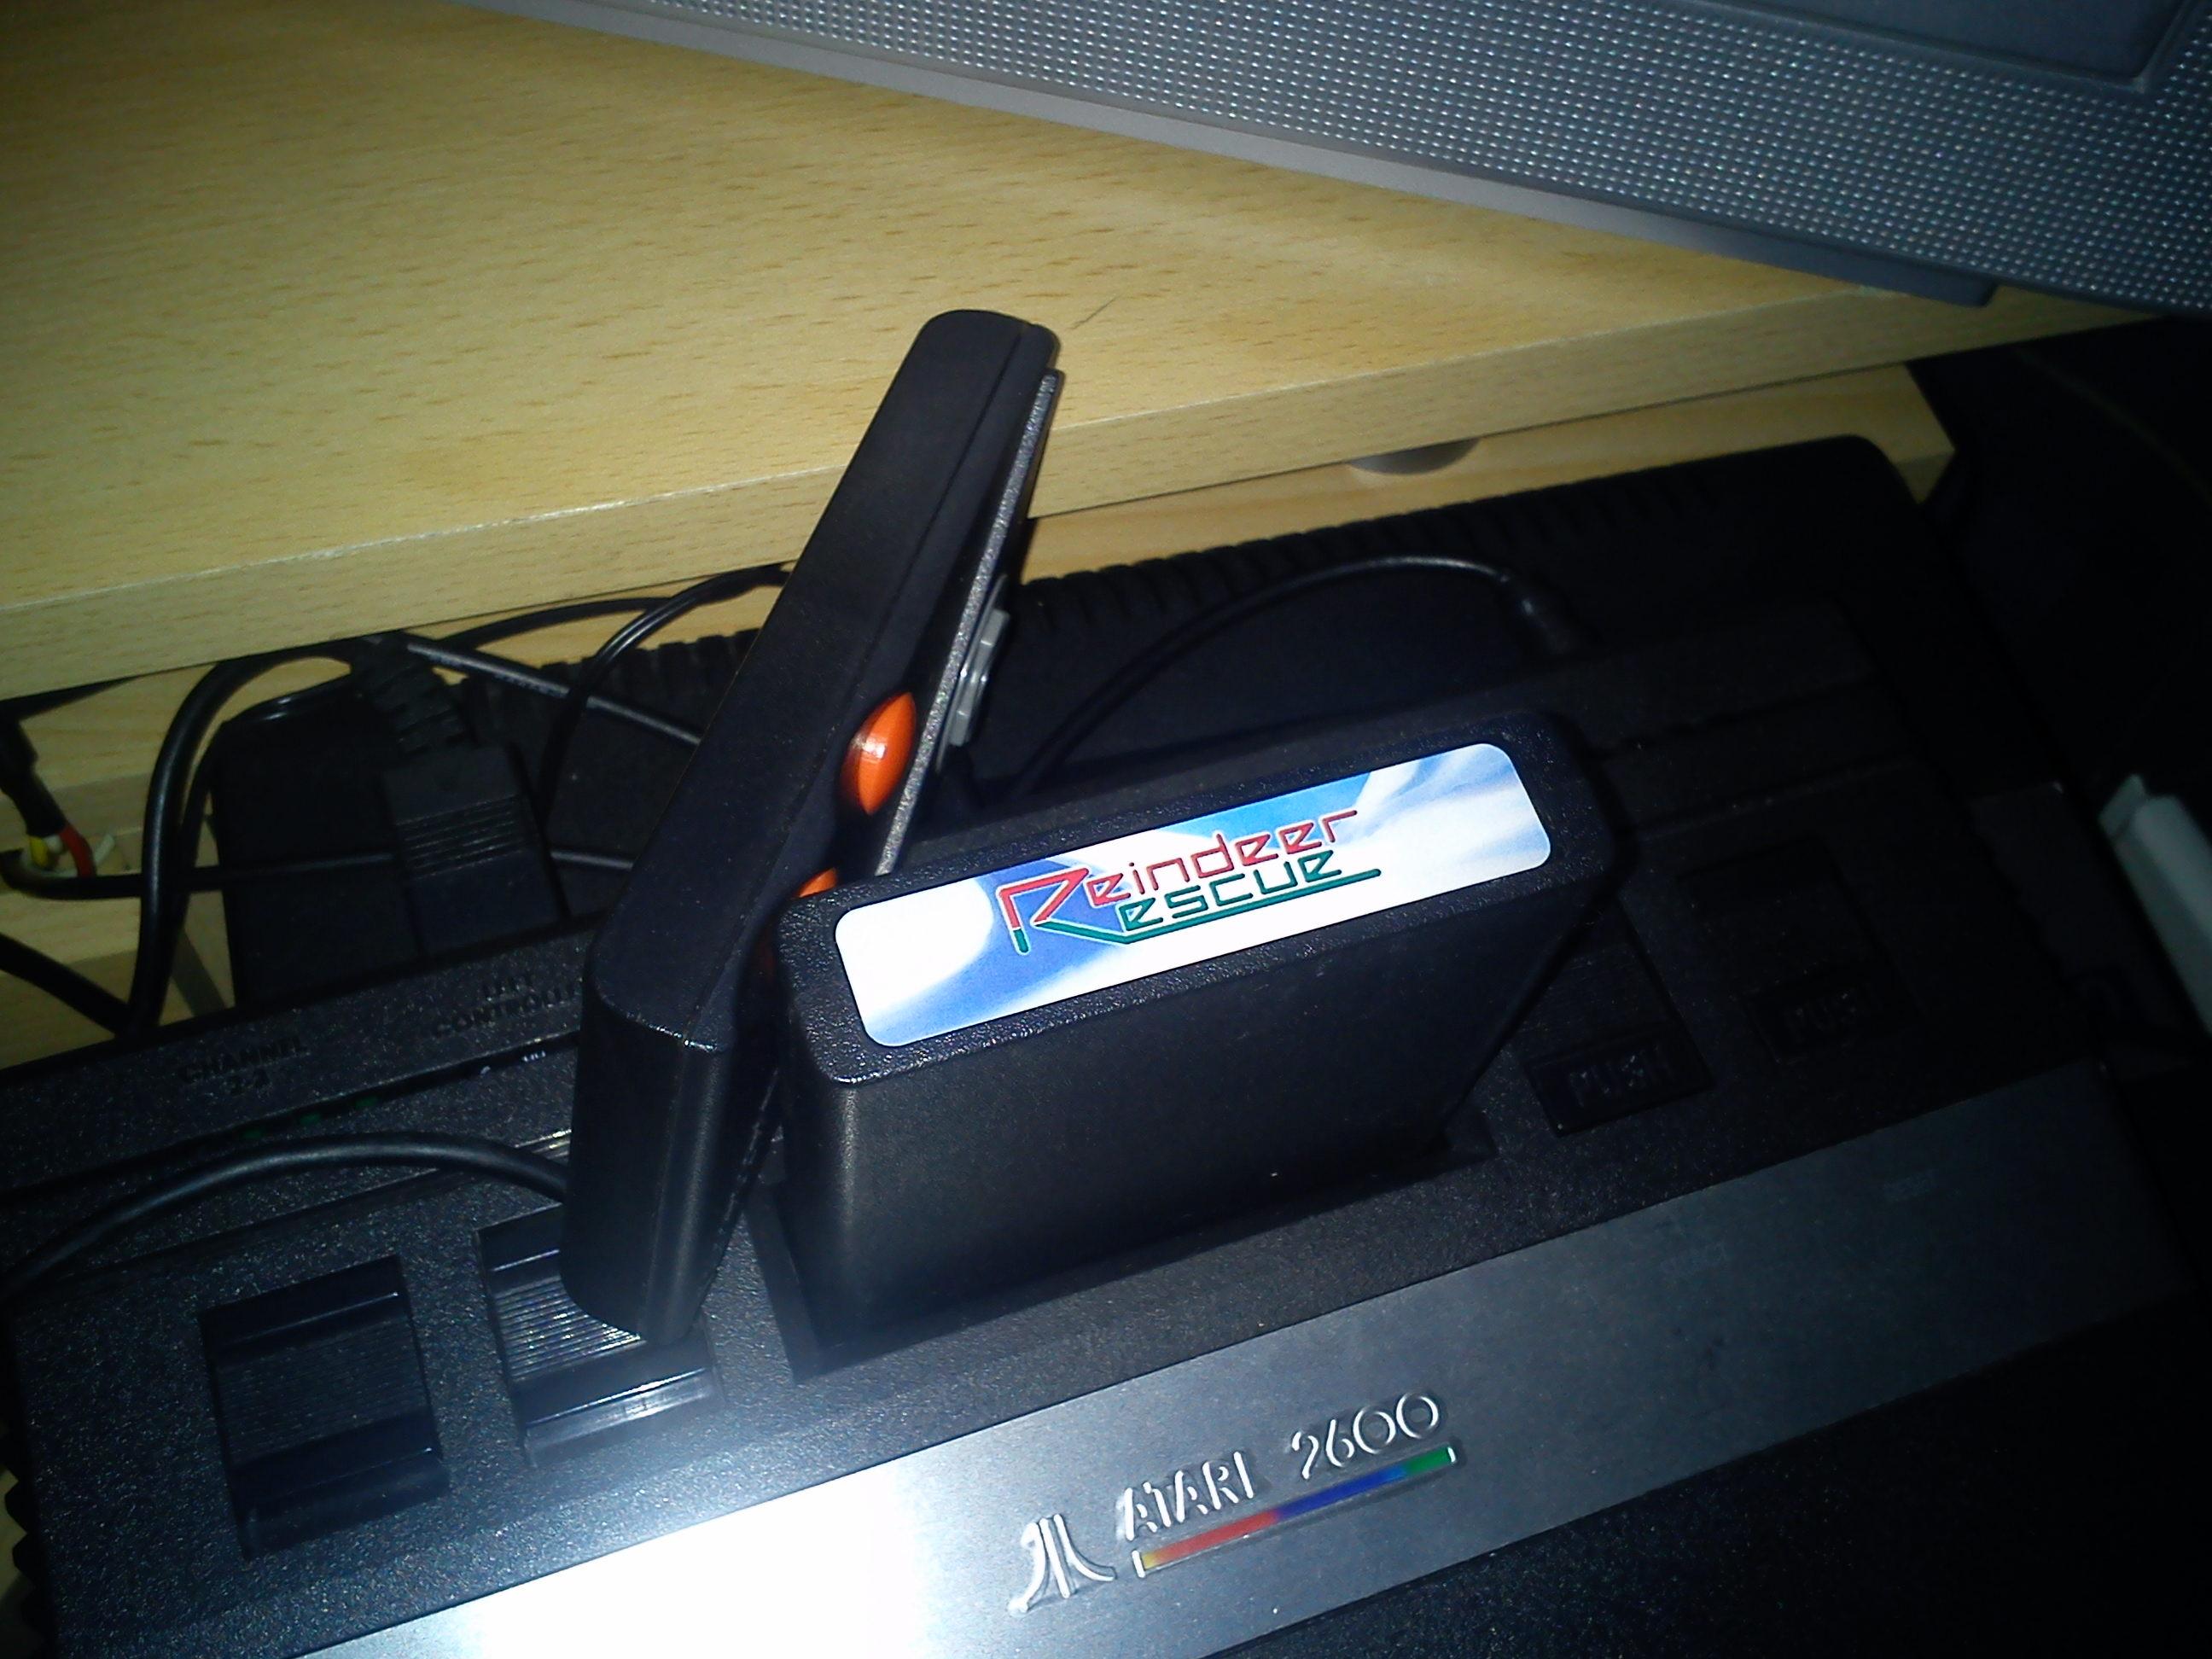 Fr0st: Reindeer Rescue (Atari 2600 Novice/B) 24,250 points on 2014-06-09 17:04:20